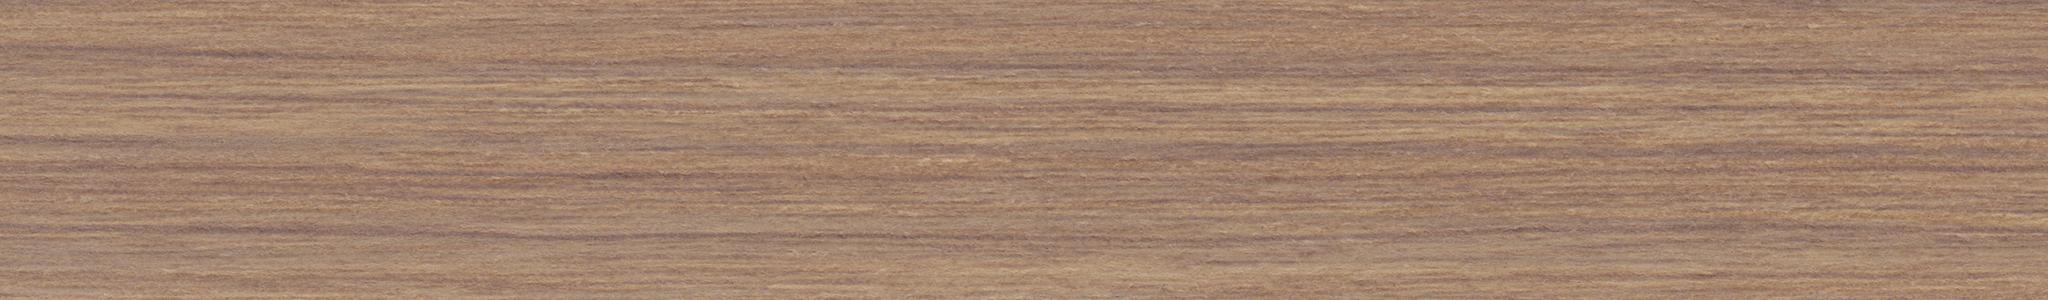 HD 295045 ABS hrana Niger gravír softmat